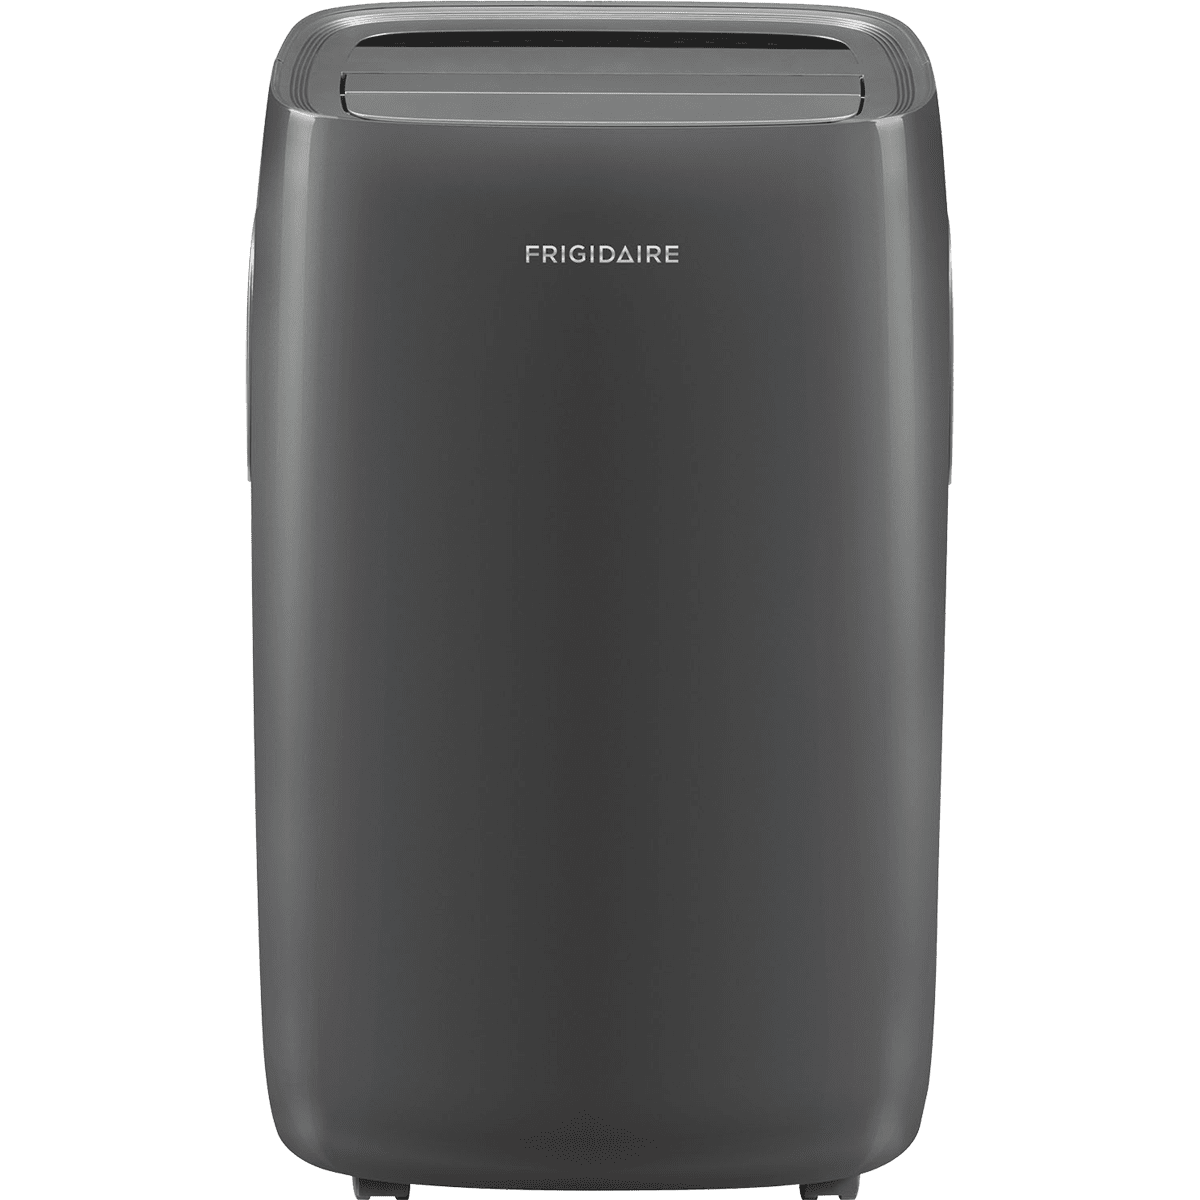 Frigidaire 14,000 BTU Portable Air Conditioner w/ Heat fr6403